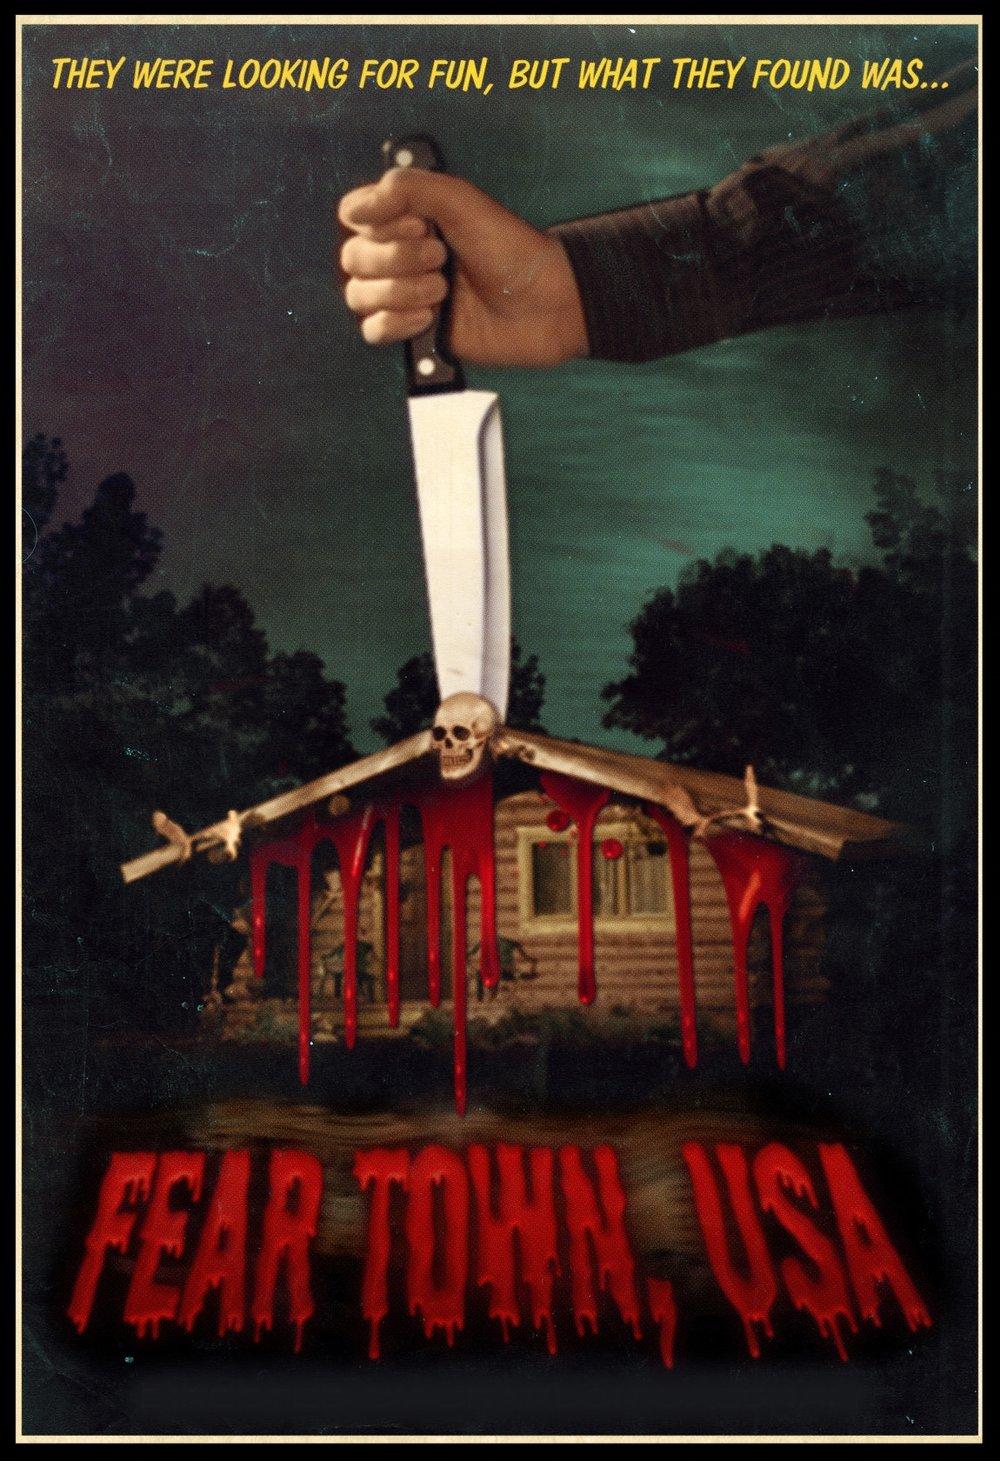 fear town USA poster.jpg